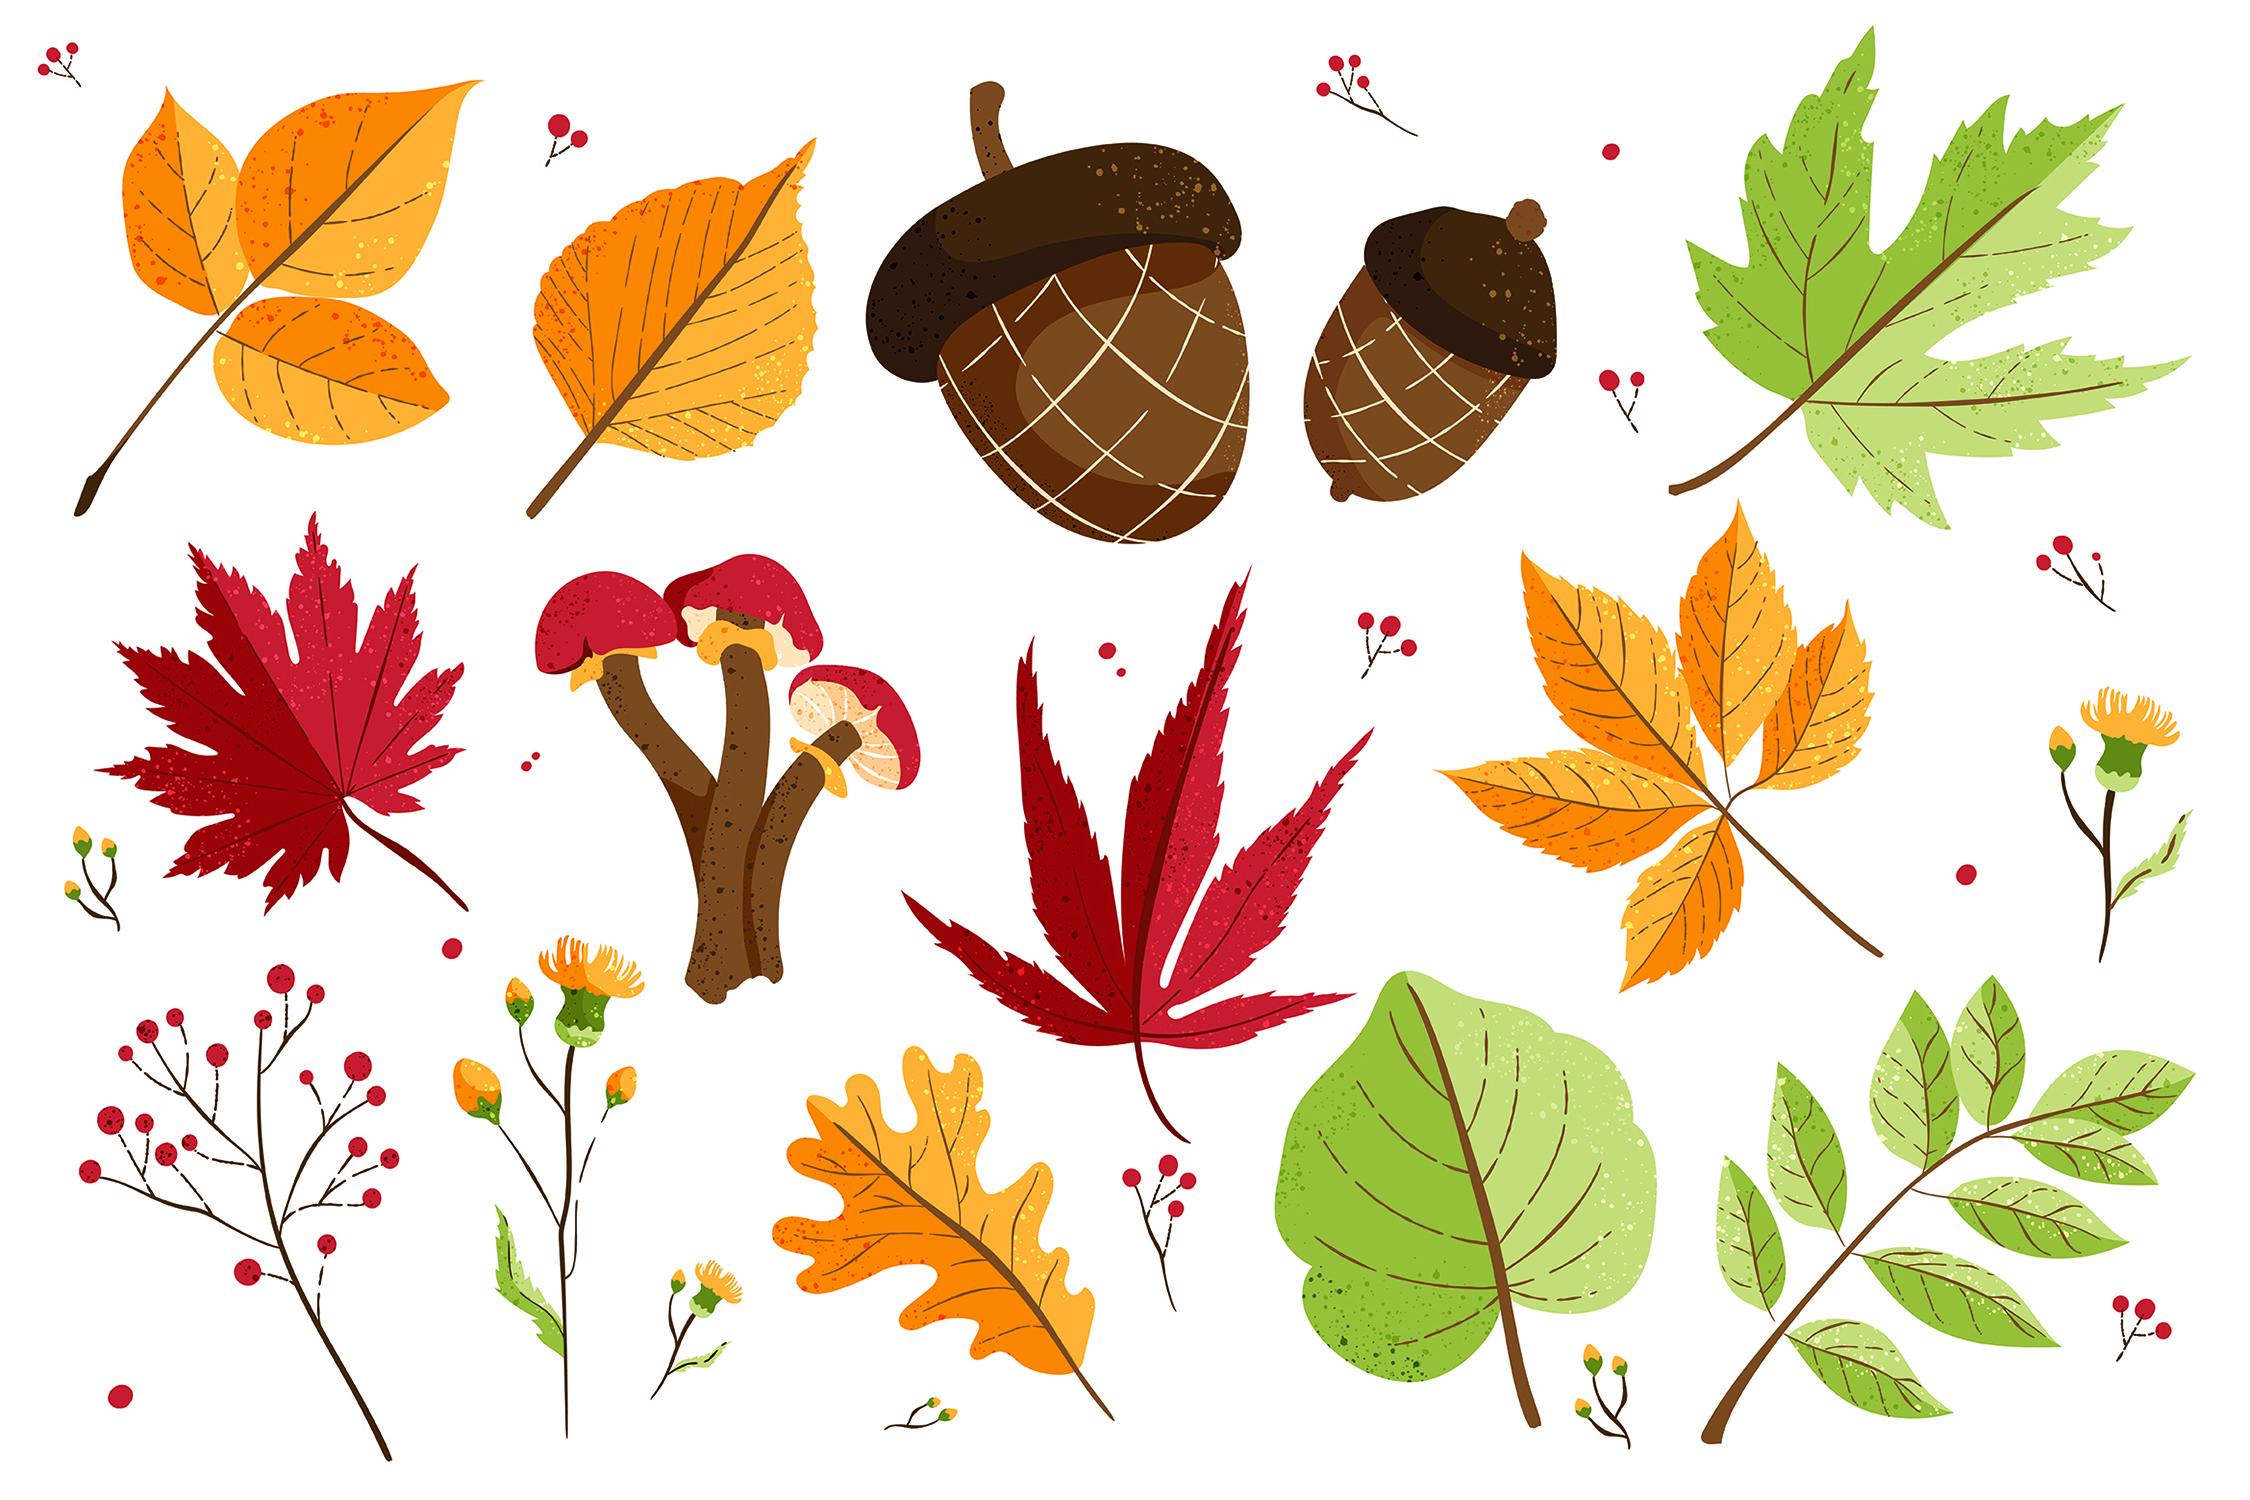 Autumn Fall Foliage Acorn Leaves Vector Clipart Illustrations